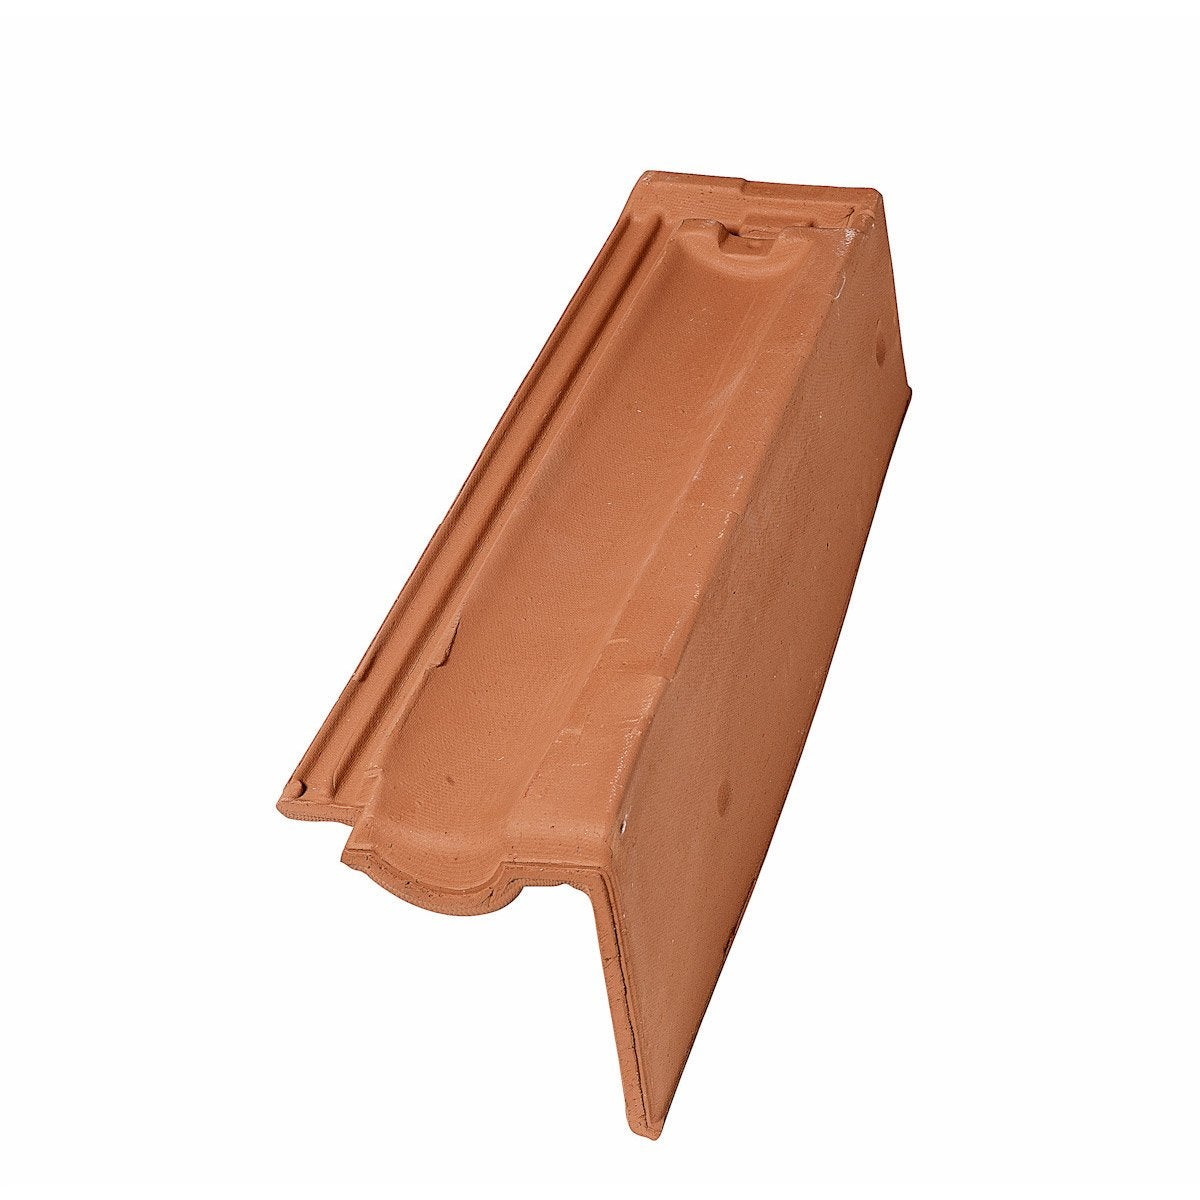 rive droite maxima cotto possagno rouge leroy merlin. Black Bedroom Furniture Sets. Home Design Ideas